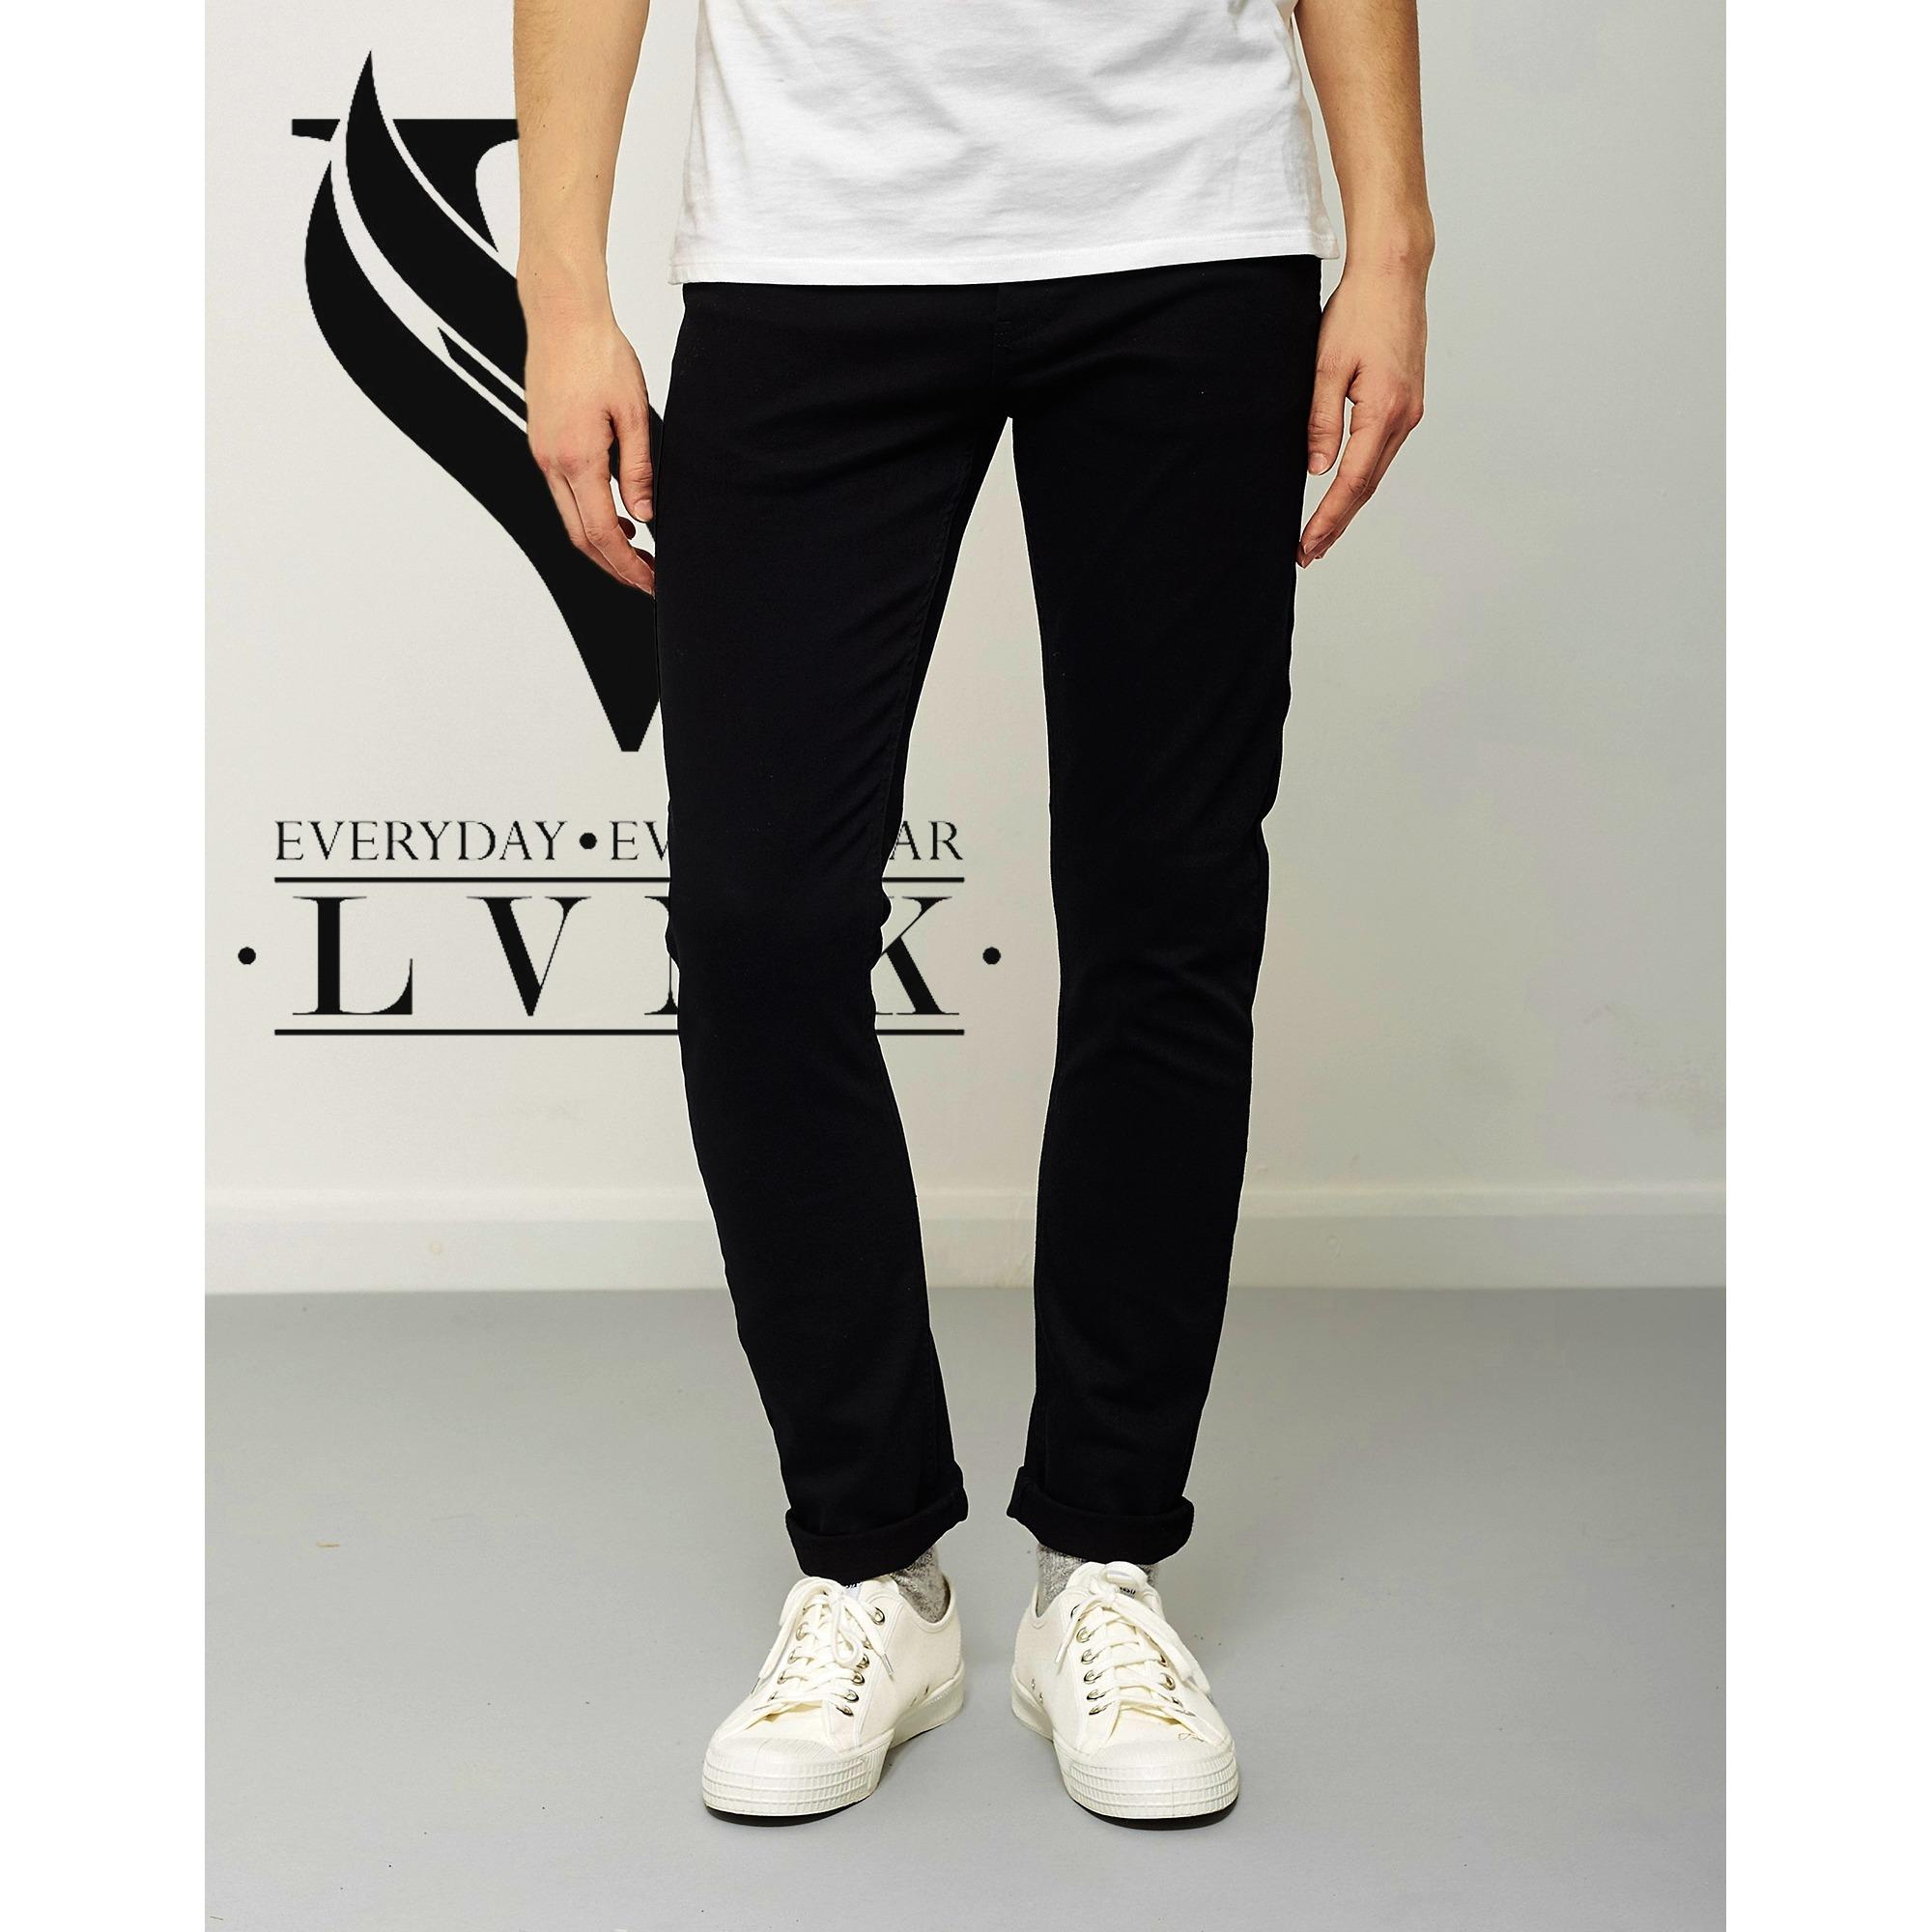 Harga Lvnk • Jeans Skinny Hitam Original Motz Best Seller Motz Original